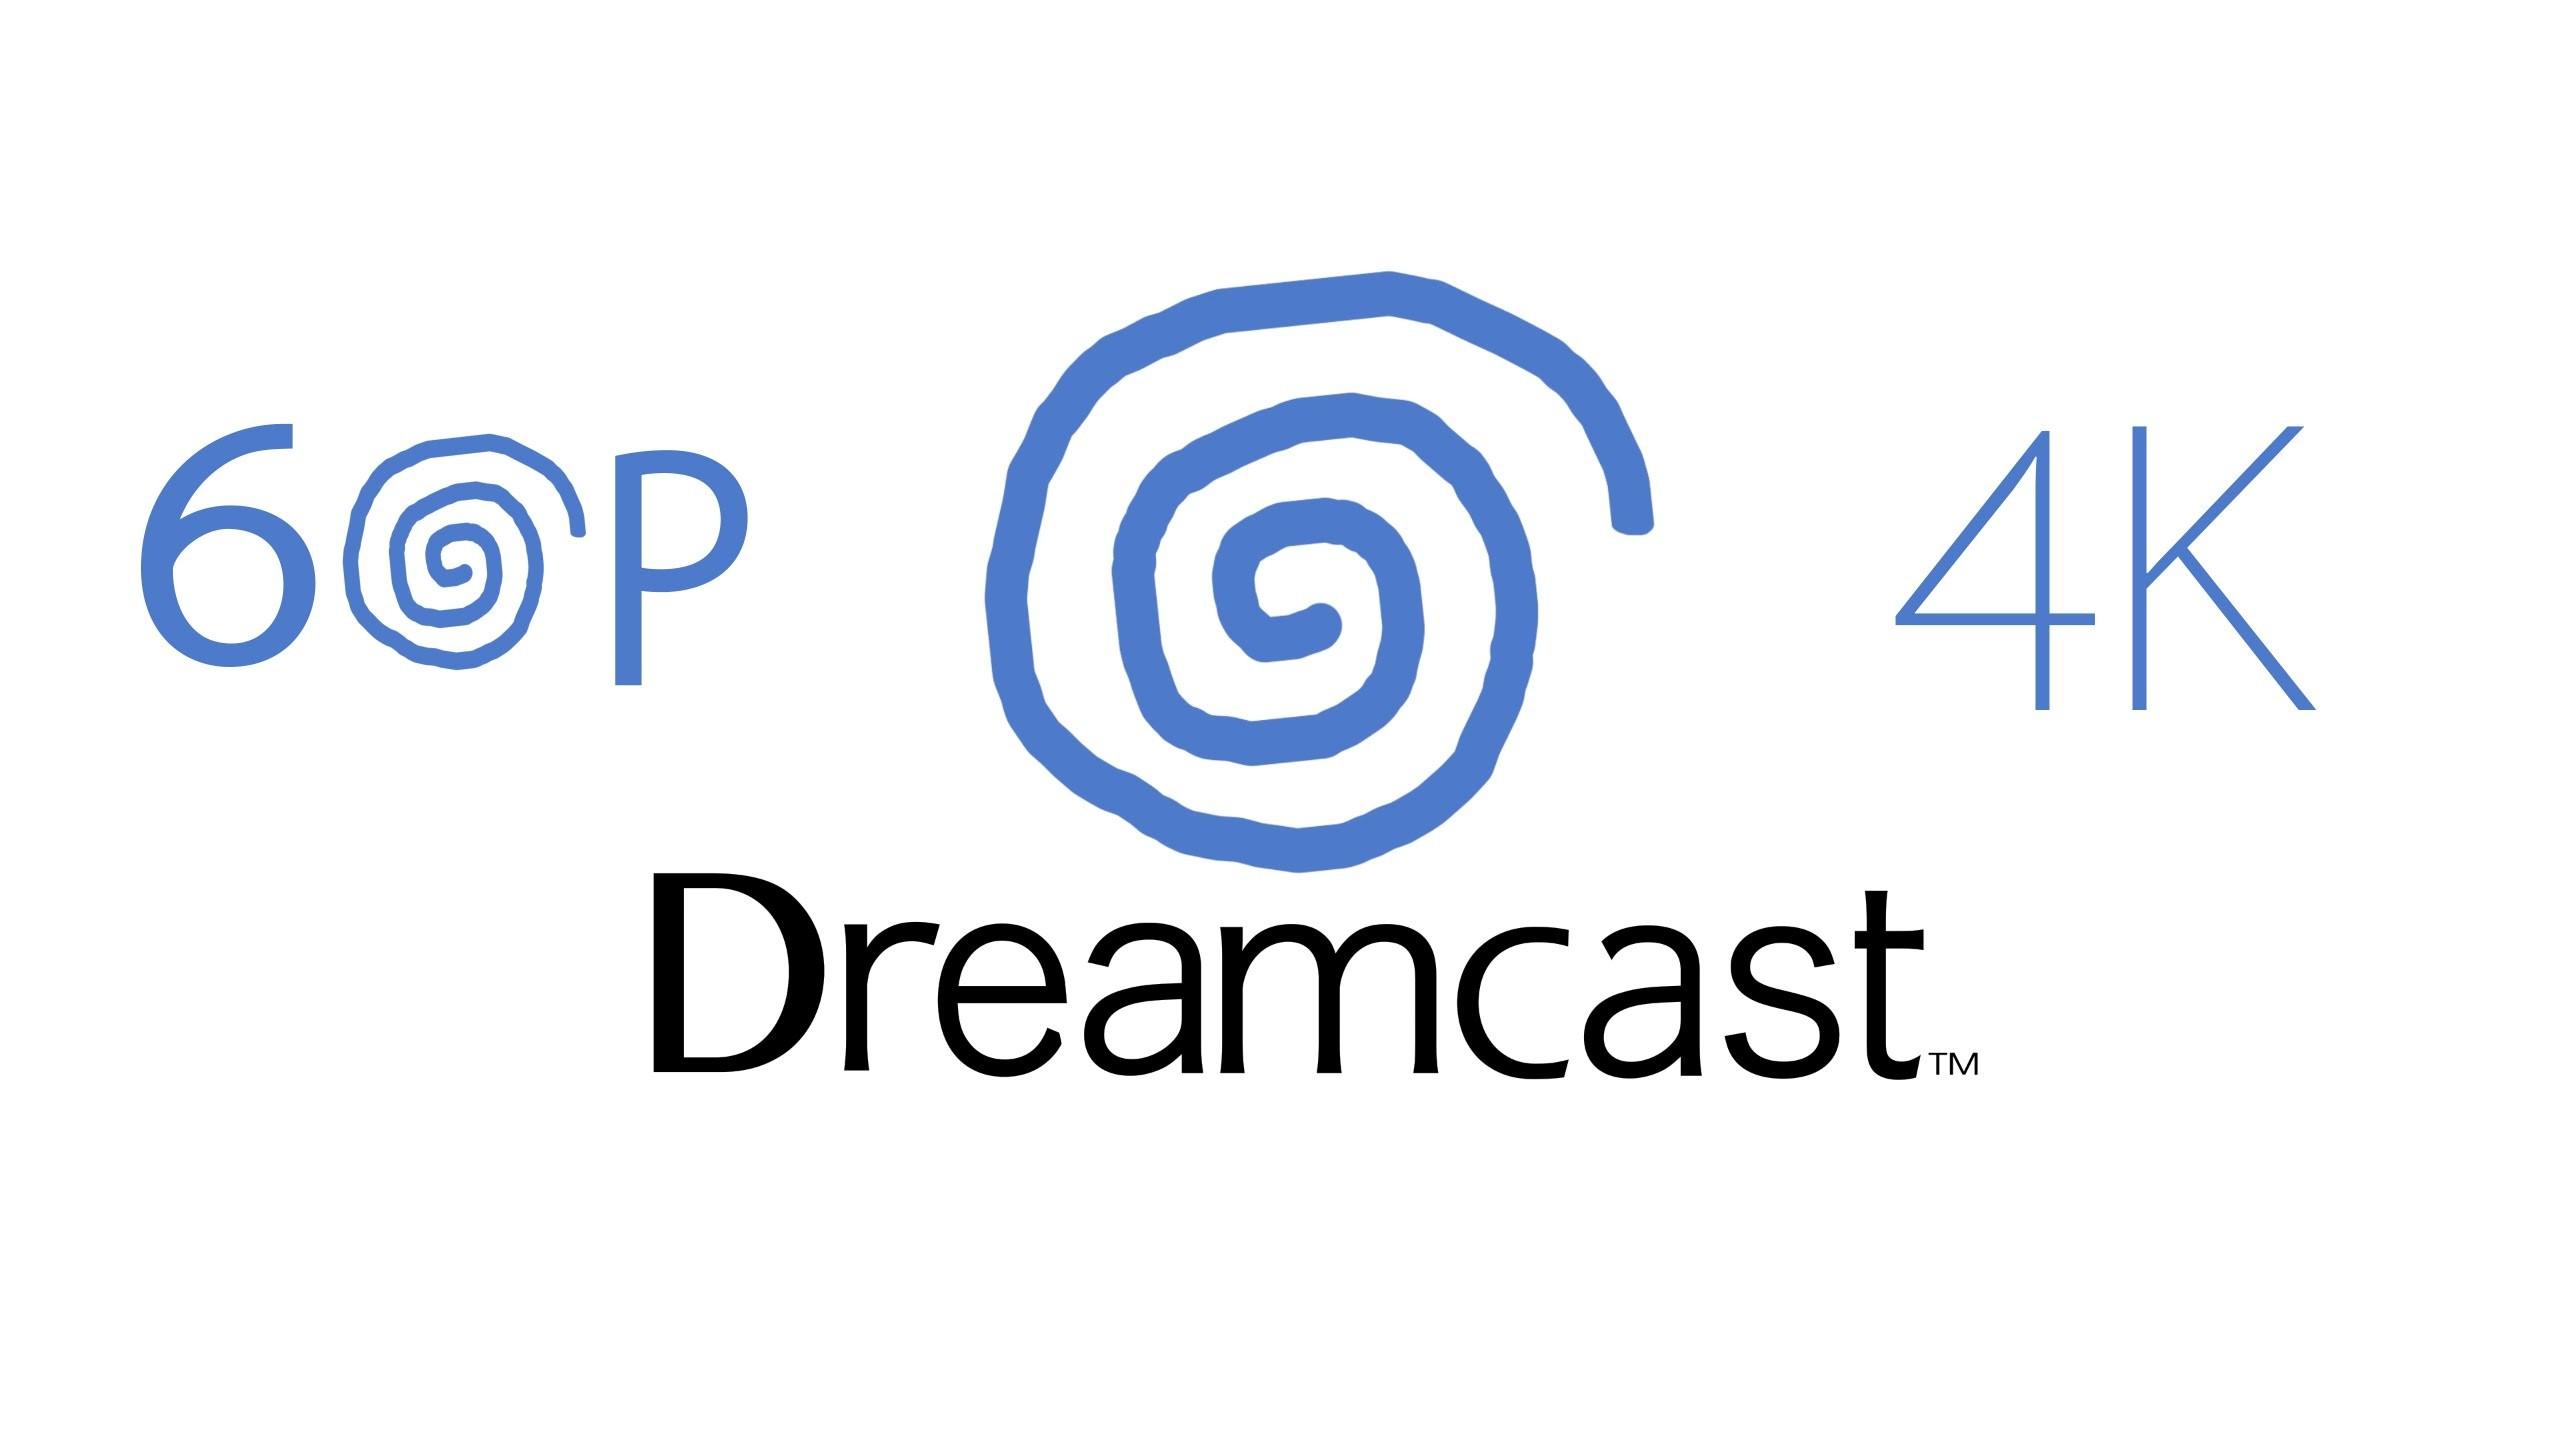 Remake Startup Sega Dreamcast 🌀 in 4K 60P FanMade – Boot-up Dreamcast  Remastered – UHD – 2016